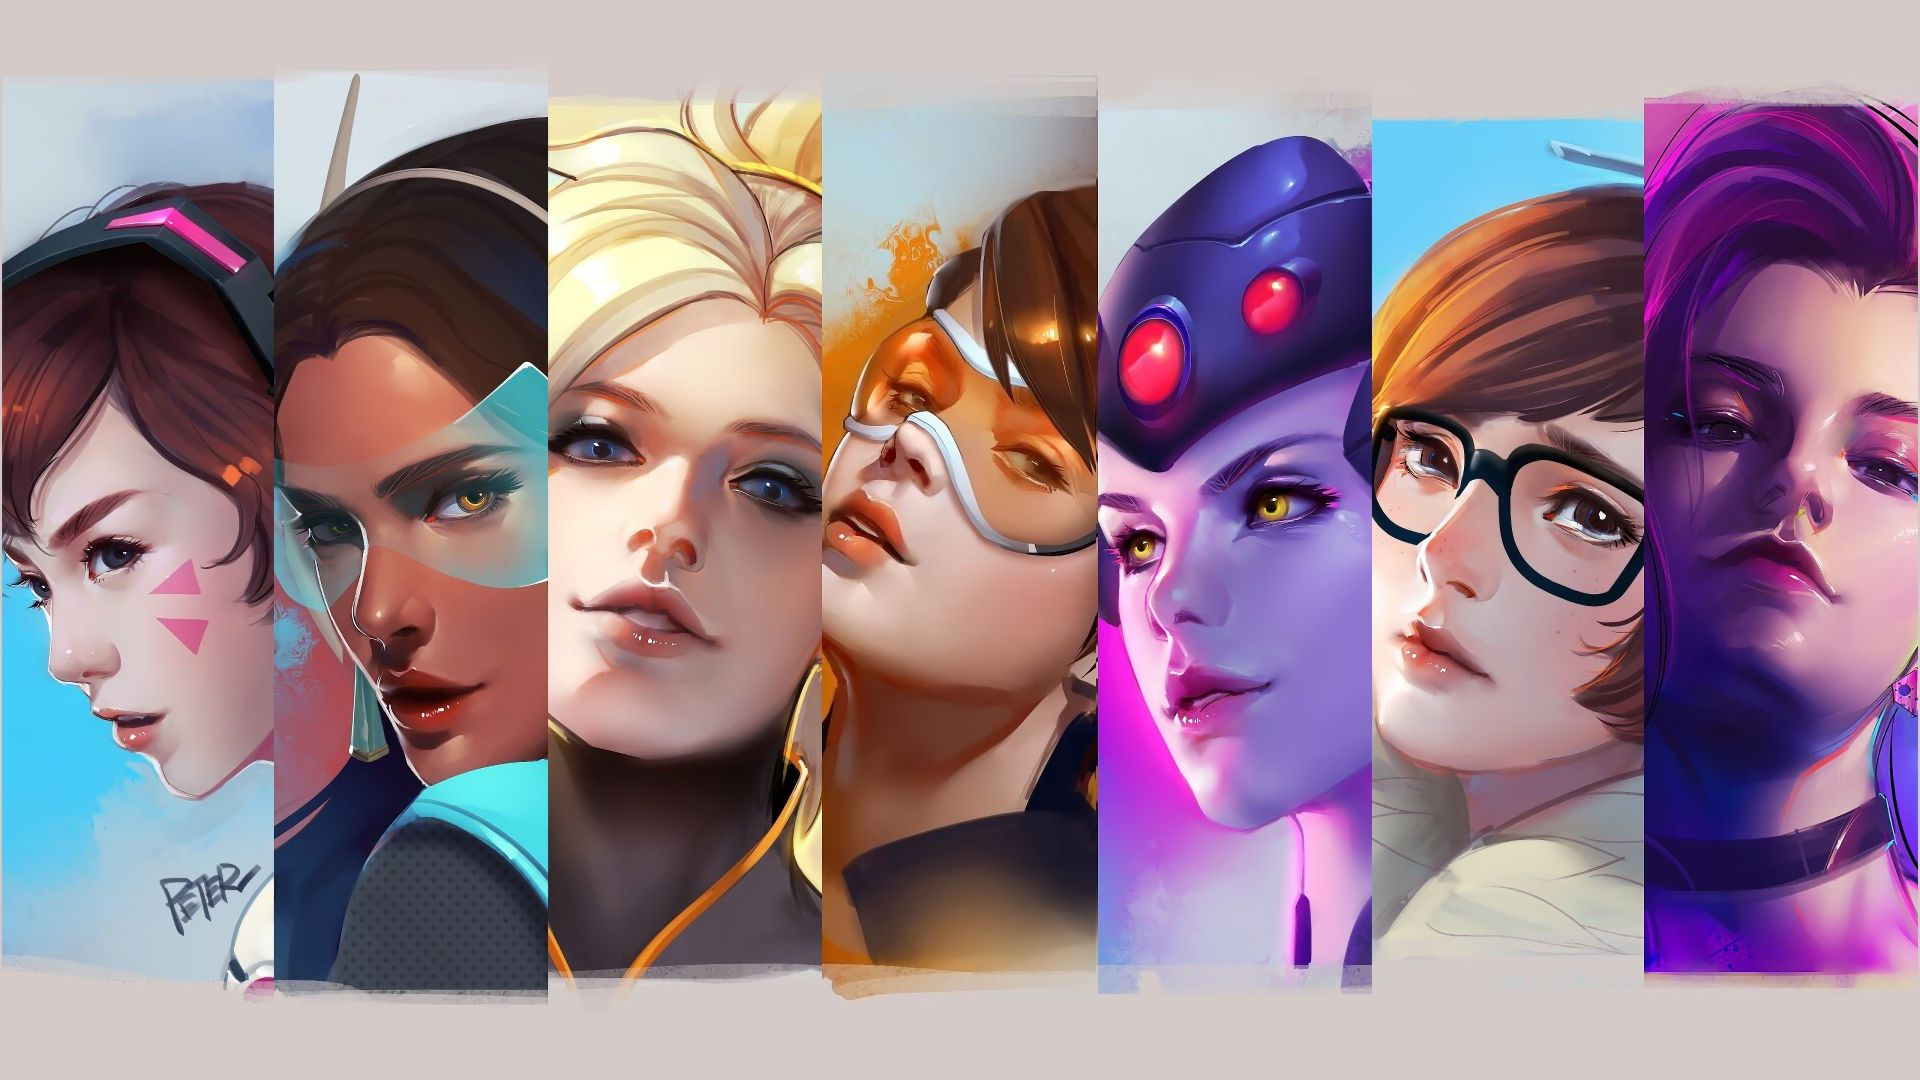 Wallpaper Overwatch, all girl, collage, D.VA, artwork, mercy, tracer, Widowmaker, 4k